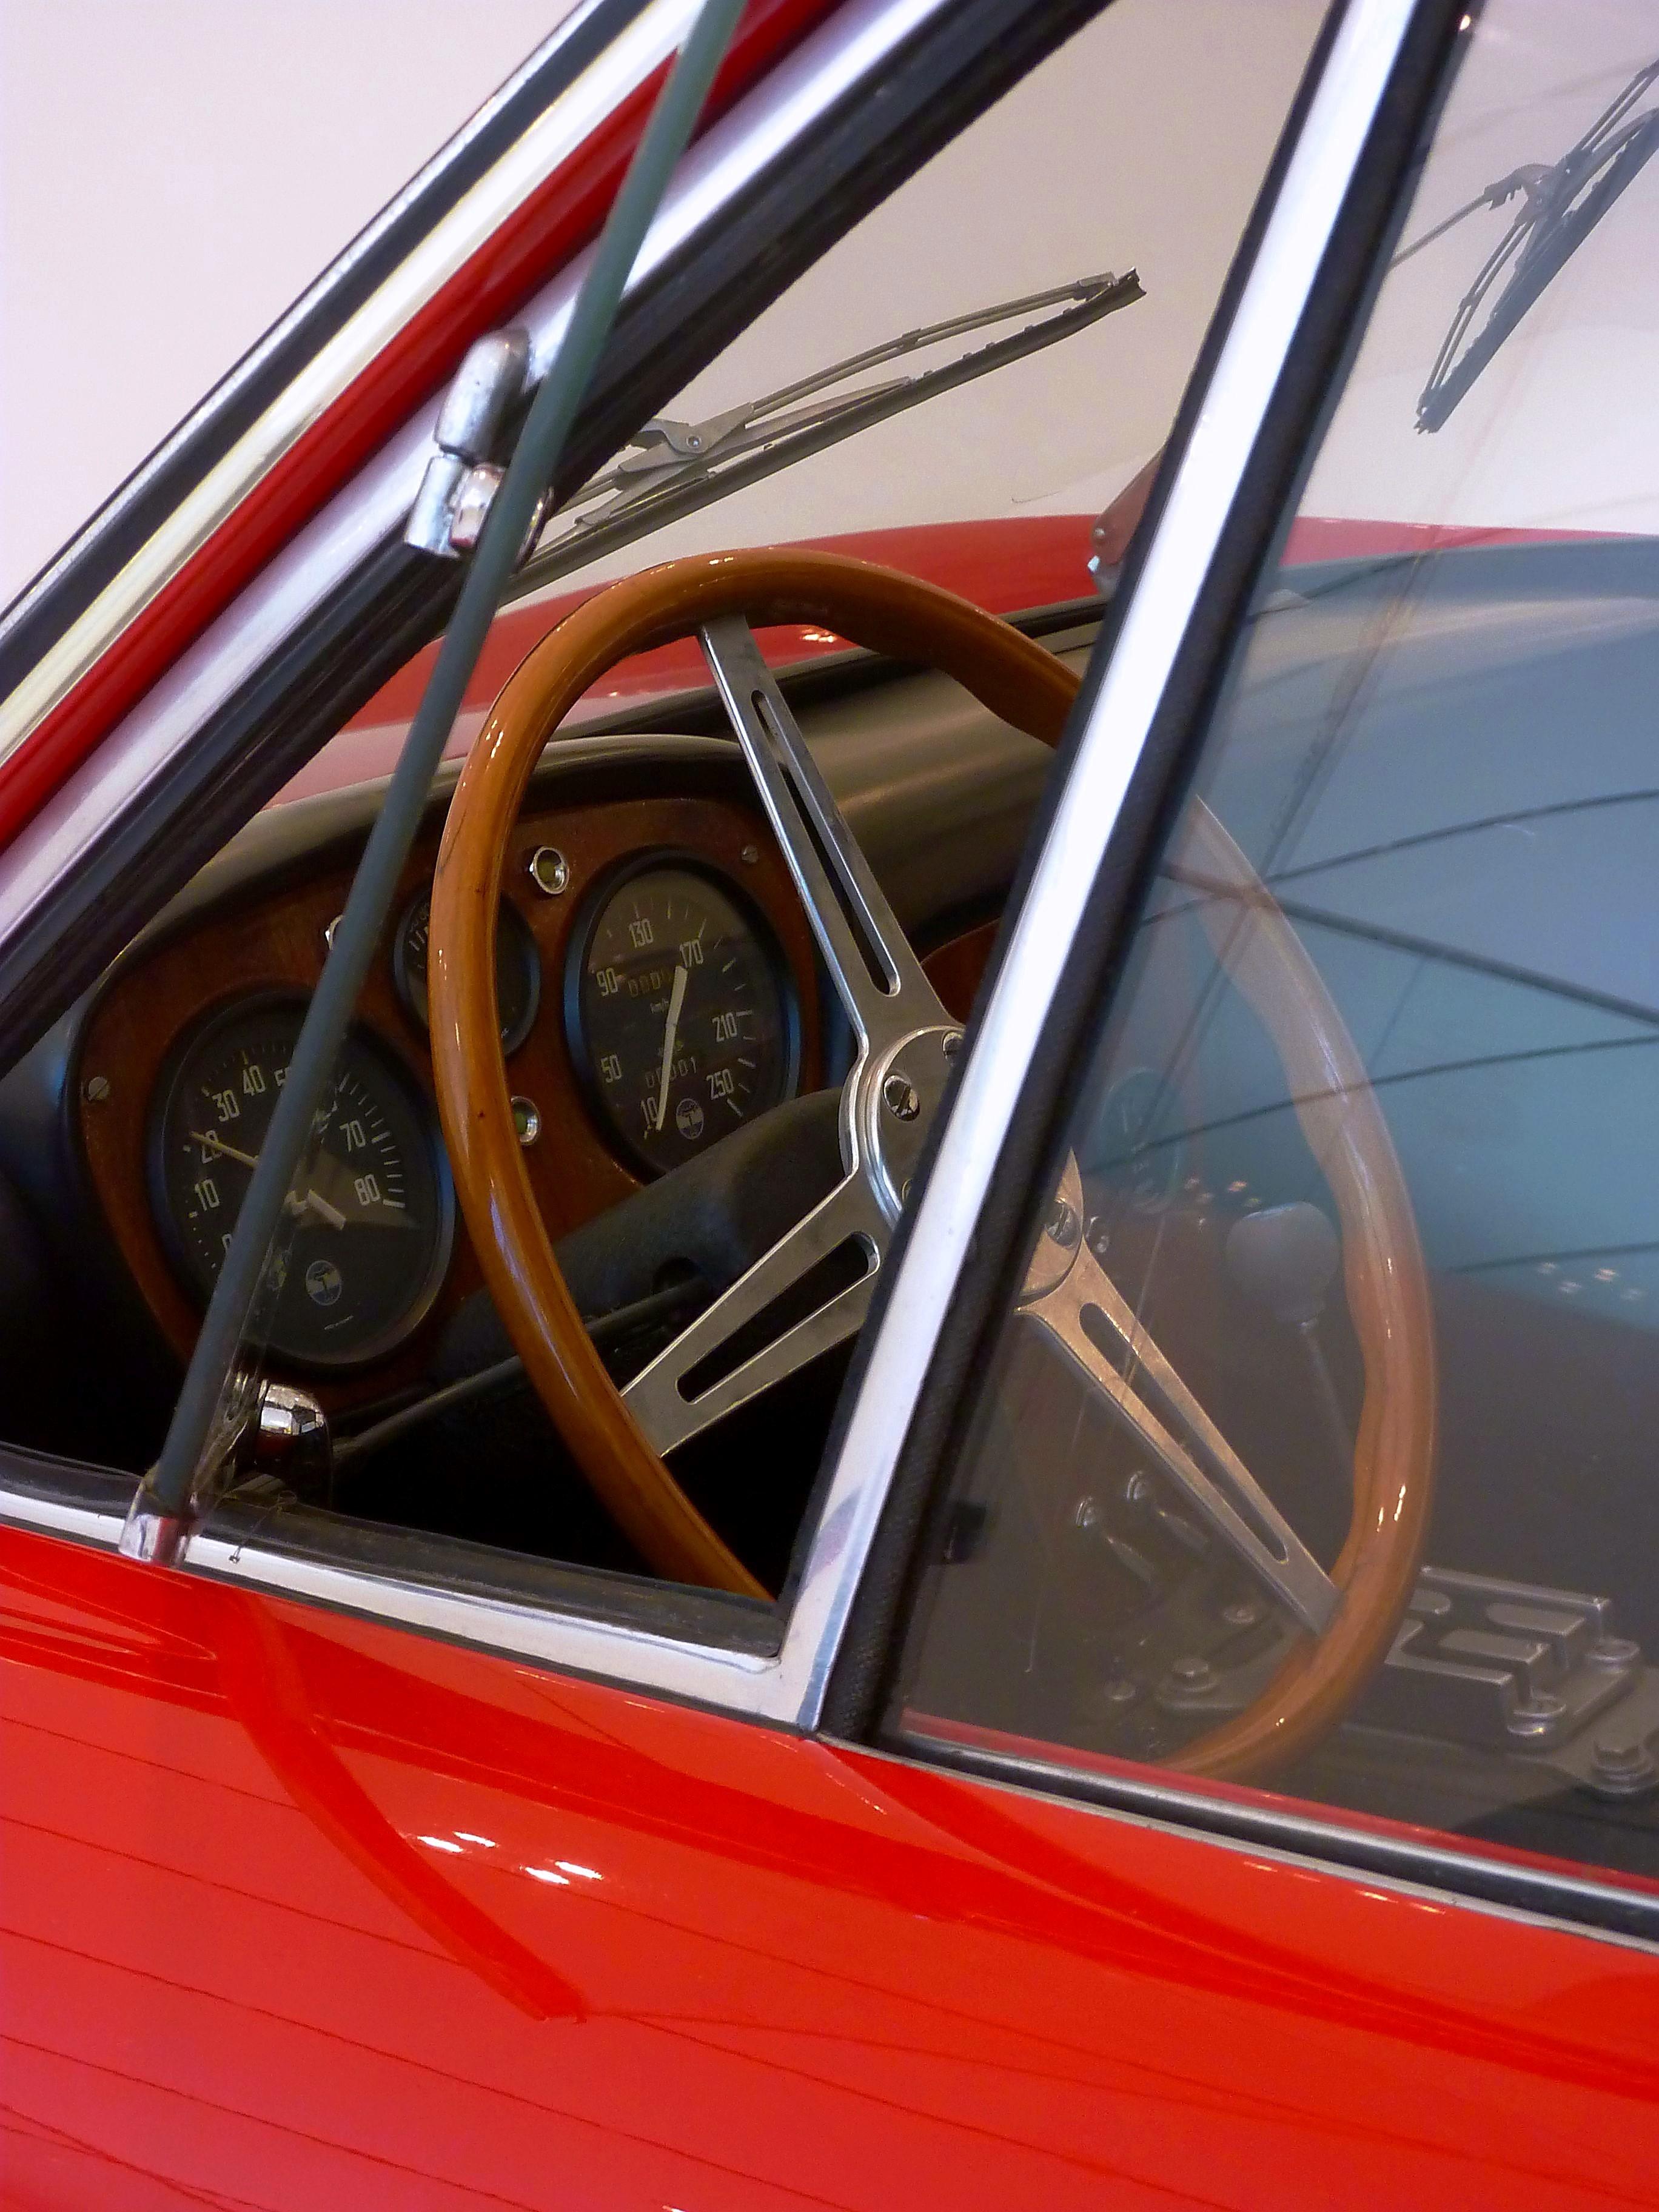 1965 De Tomaso Vallelunga (12)_filtered